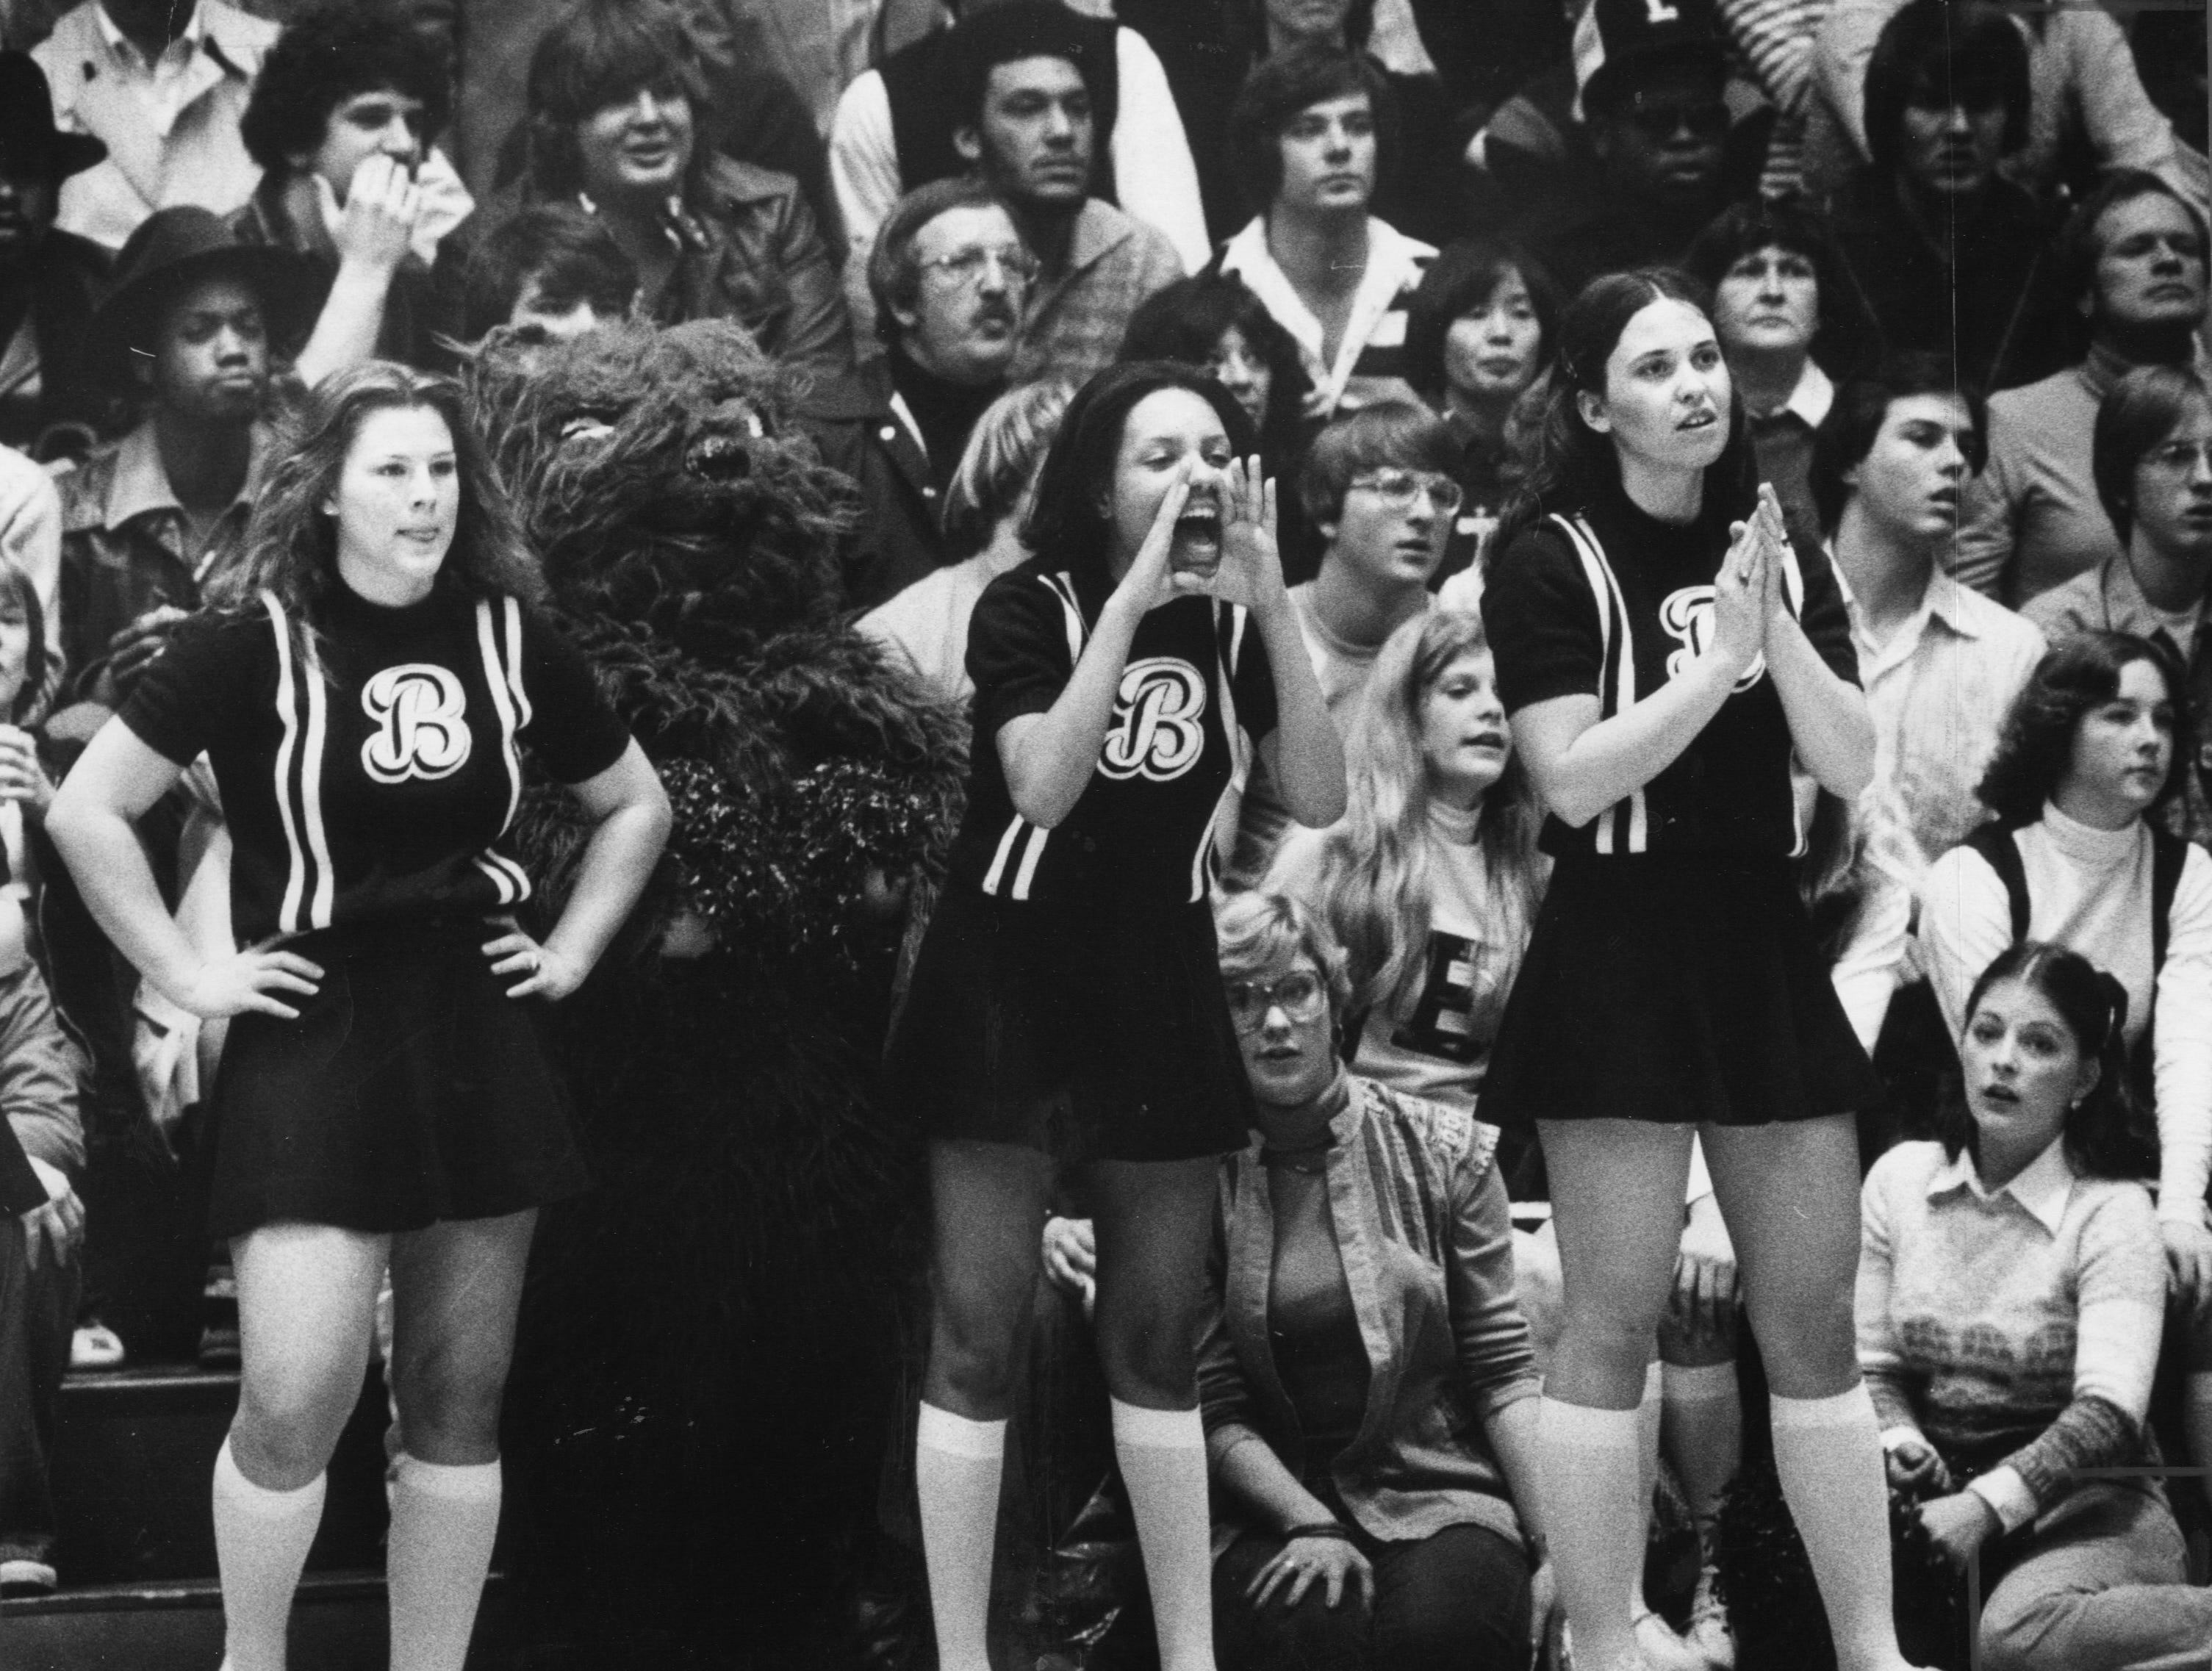 Ballard cheerleaders (from left) Ann Higgins, Suzanne Keller and Melissa Summer cheer on their team against Jeffersonville. Feb. 5, 1977